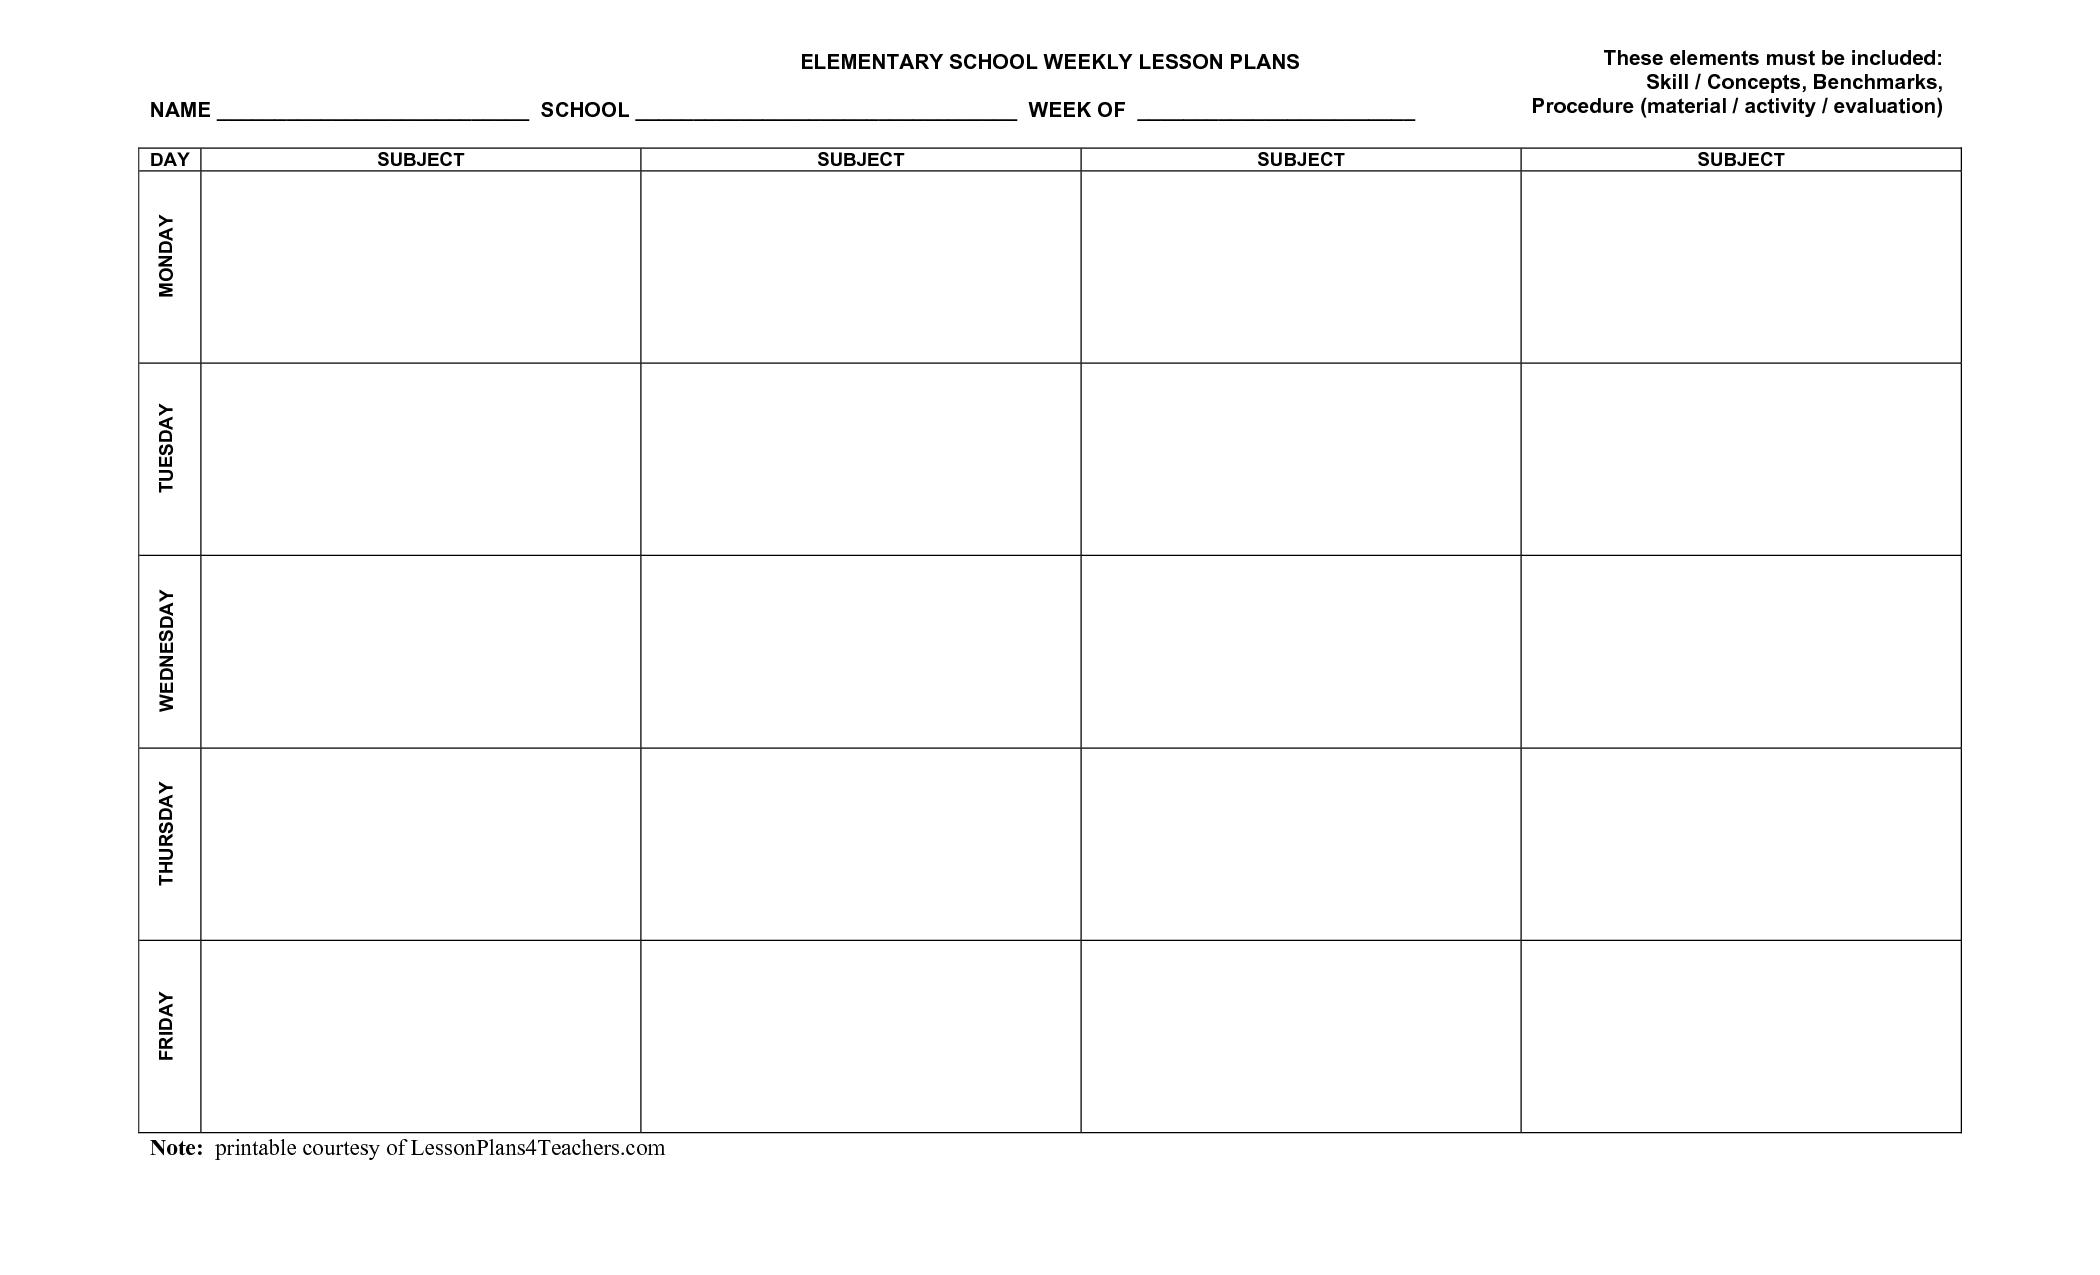 Printable Lesson Plan Pages - Kaza.psstech.co - Free Printable Lesson Plan Template